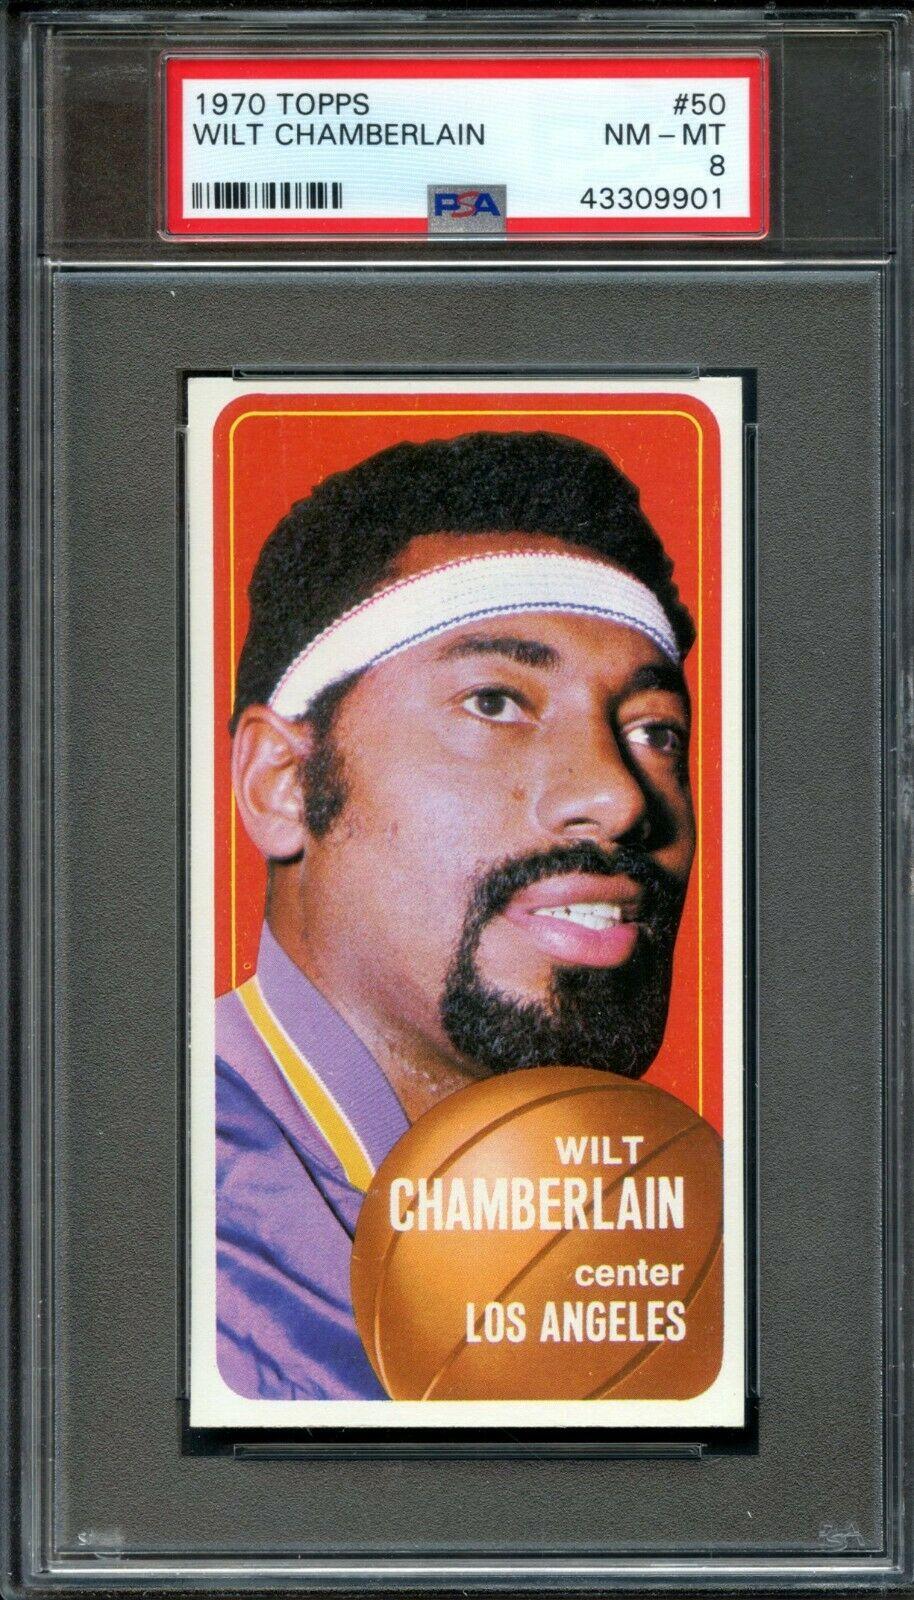 1970 Topps #50 Wilt Chamberlain PSA 8 Centered Los Angeles Lakers - Image 1